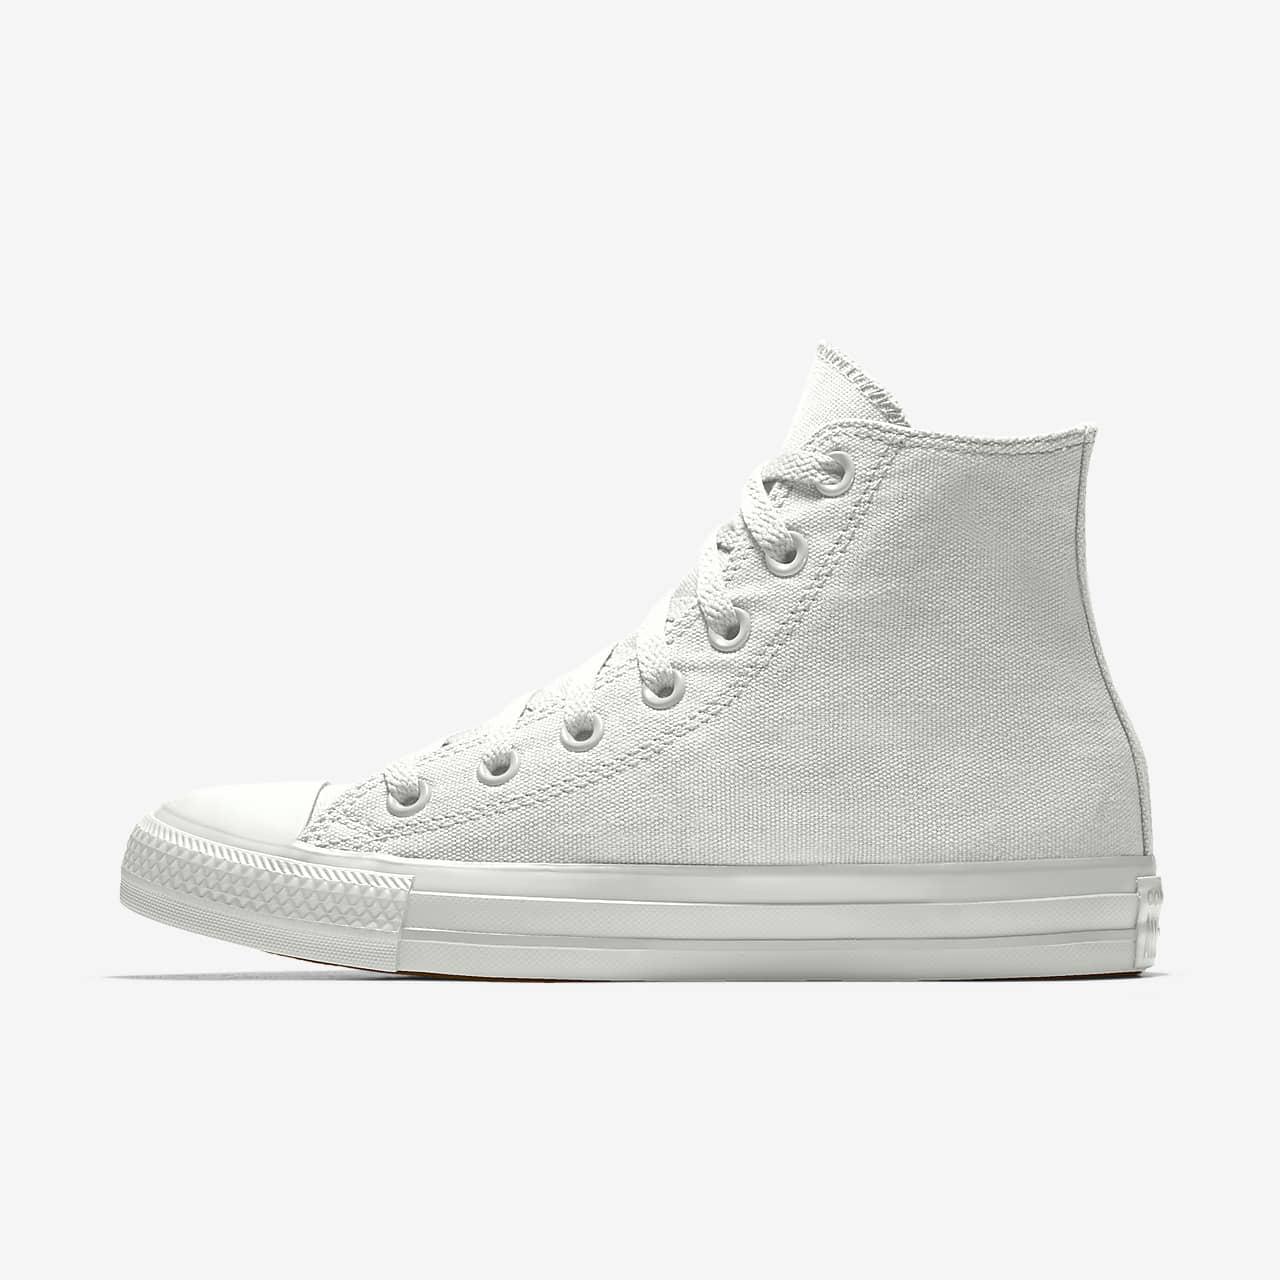 Converse Custom Chuck Taylor All Star High Top Shoe